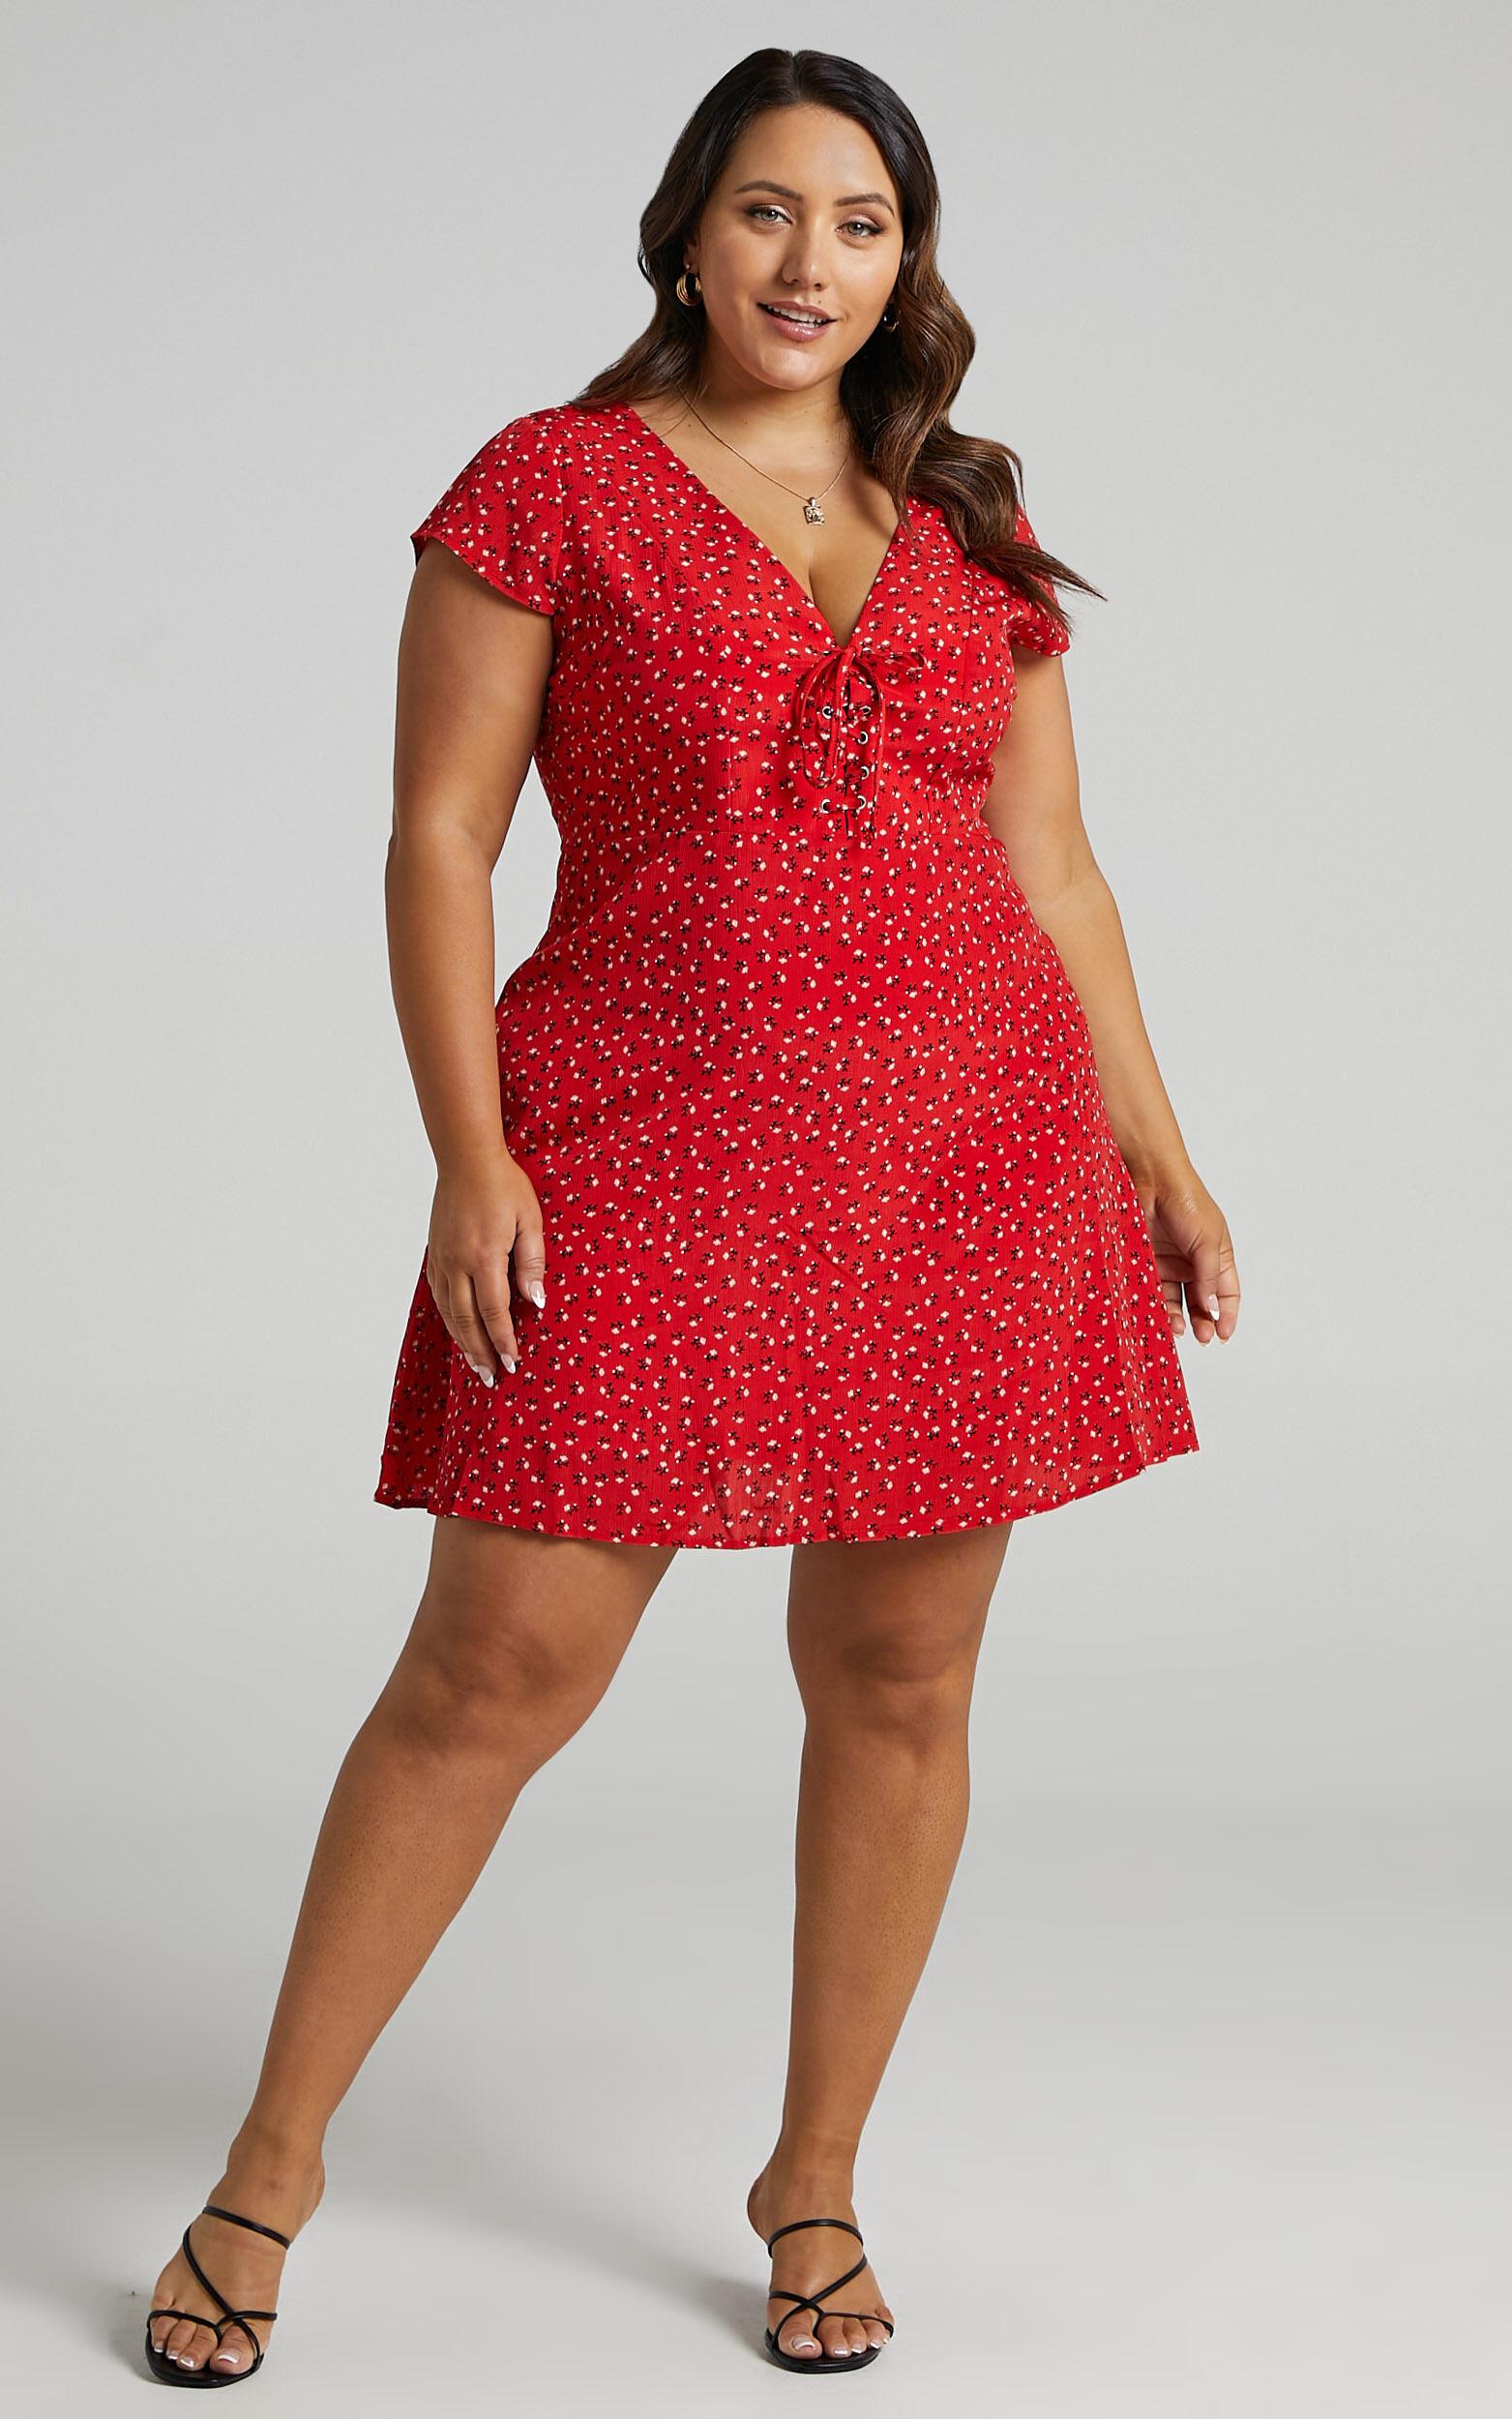 Secret Cure Dress in Red Print - 20, RED3, super-hi-res image number null